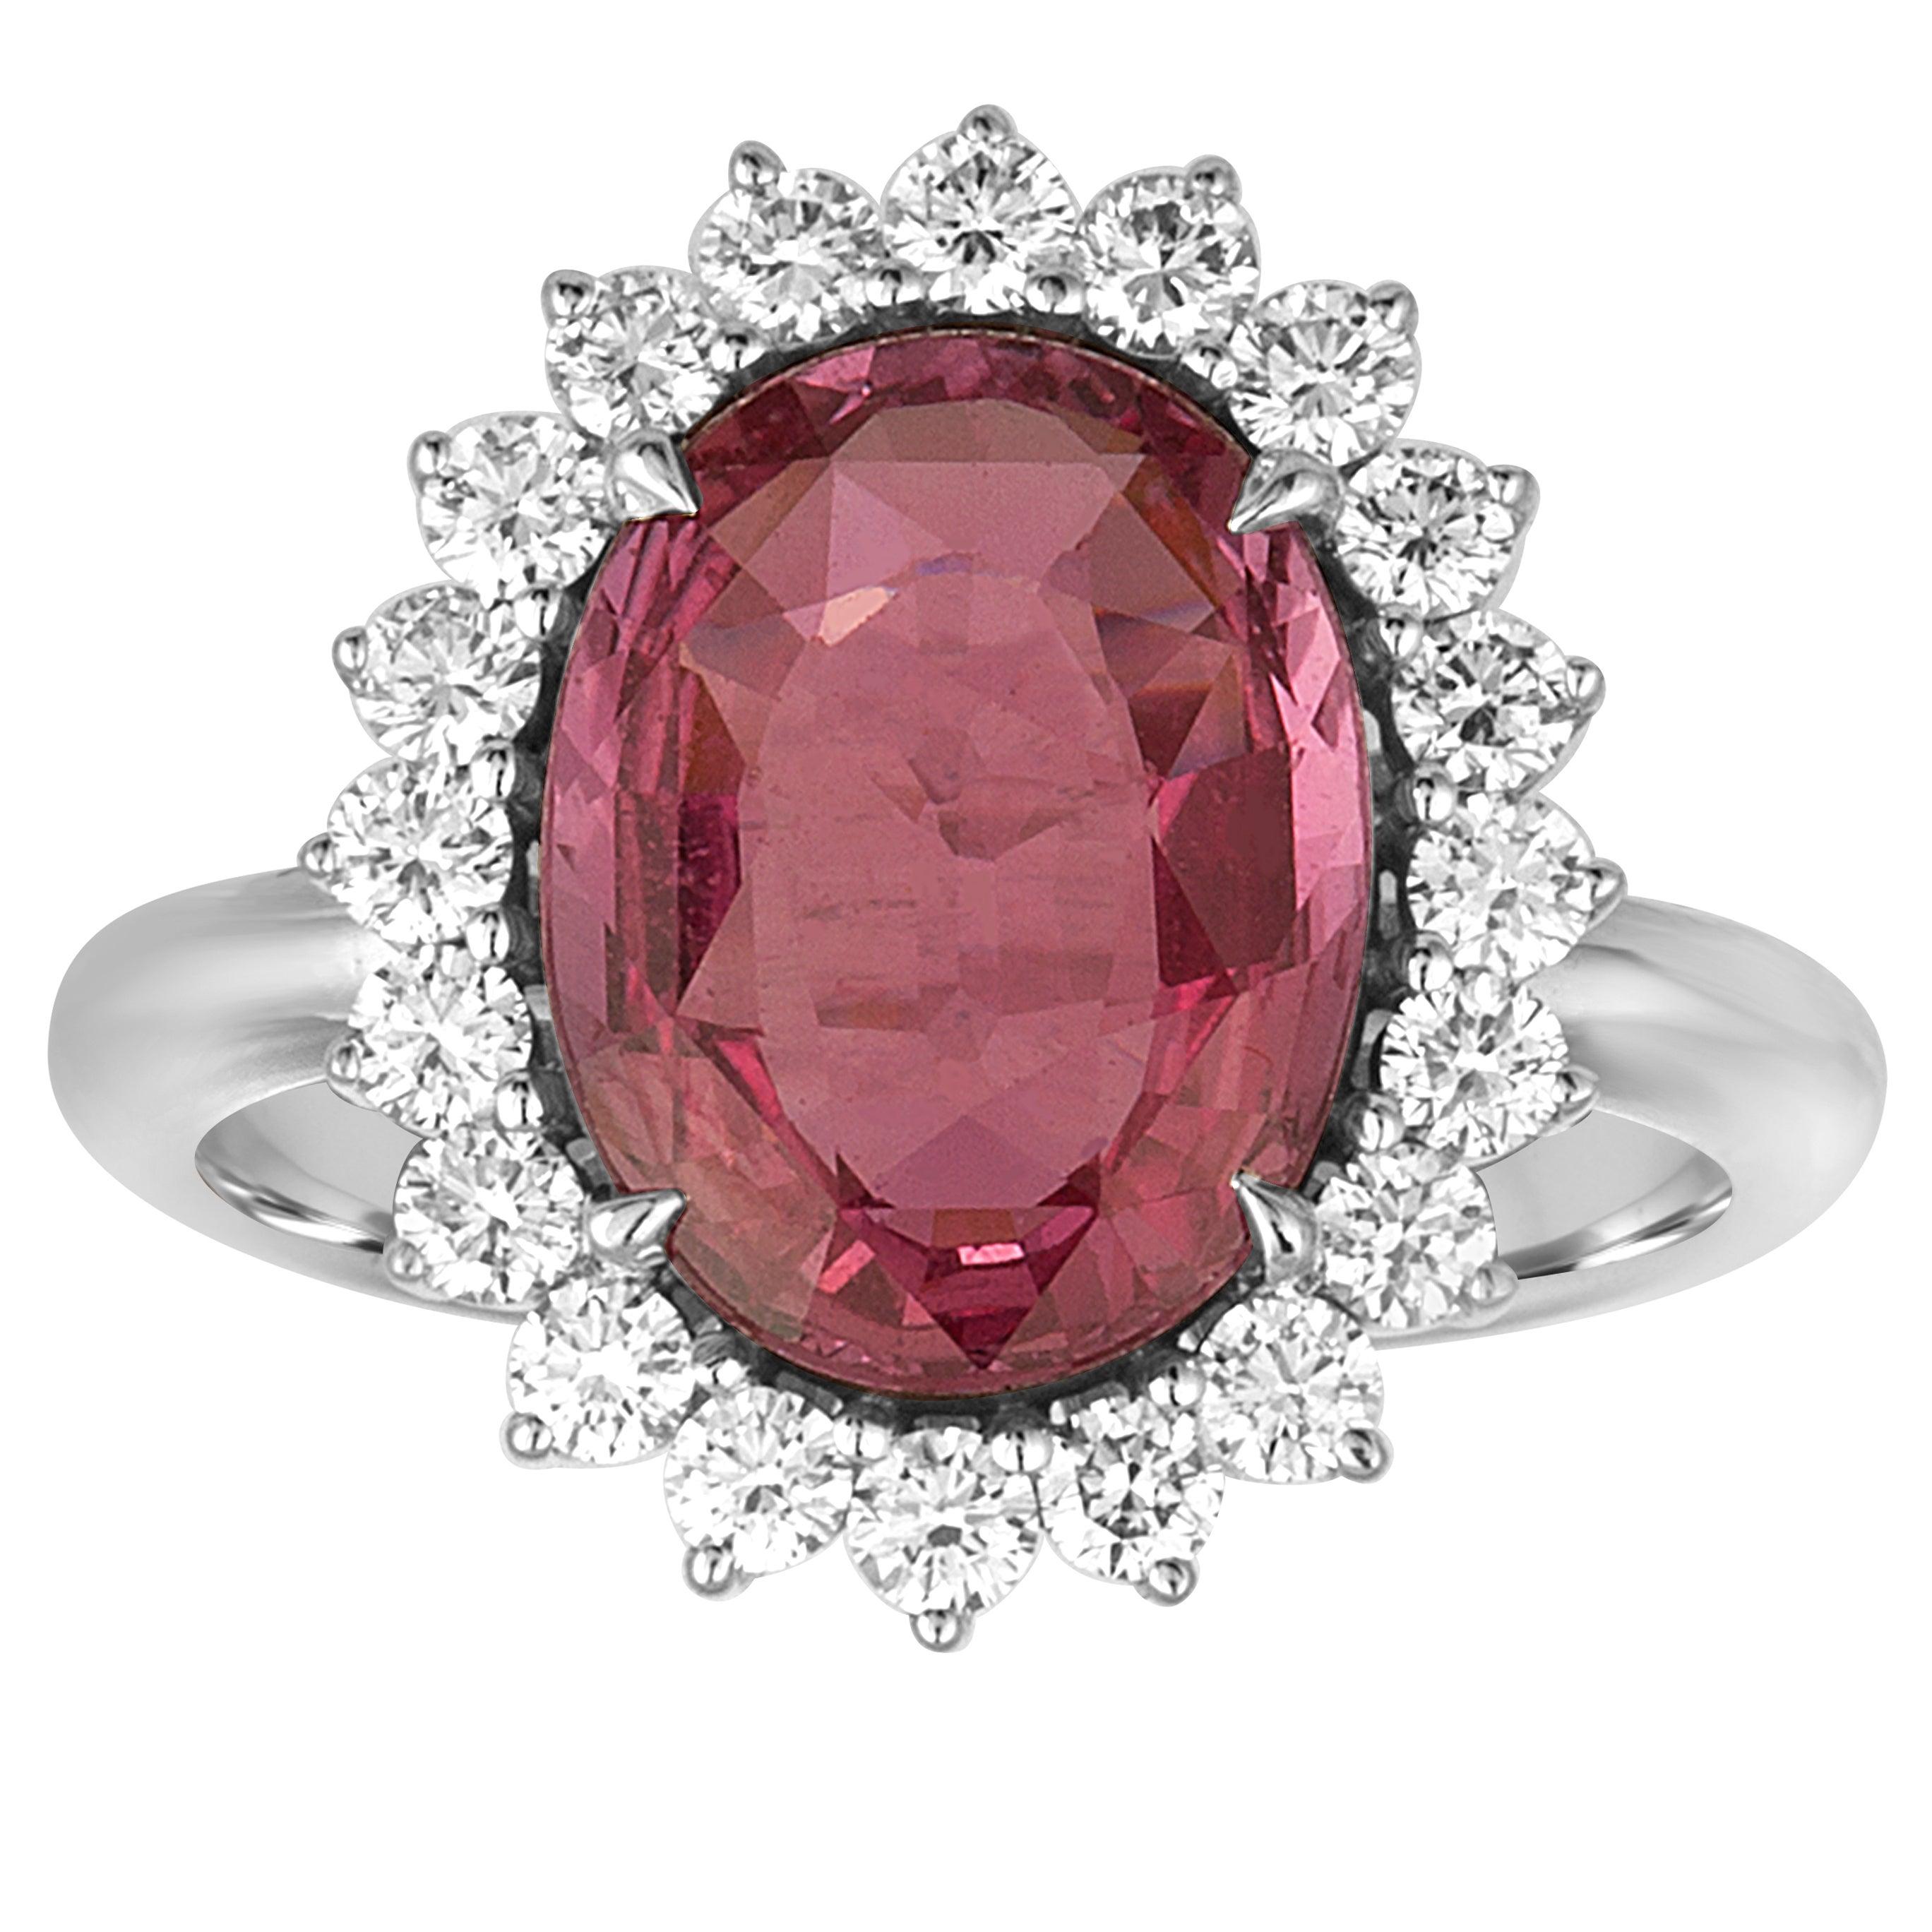 Kian Design 2.23 Carat Certified Oval Pink Sapphire and Diamond Ring ...